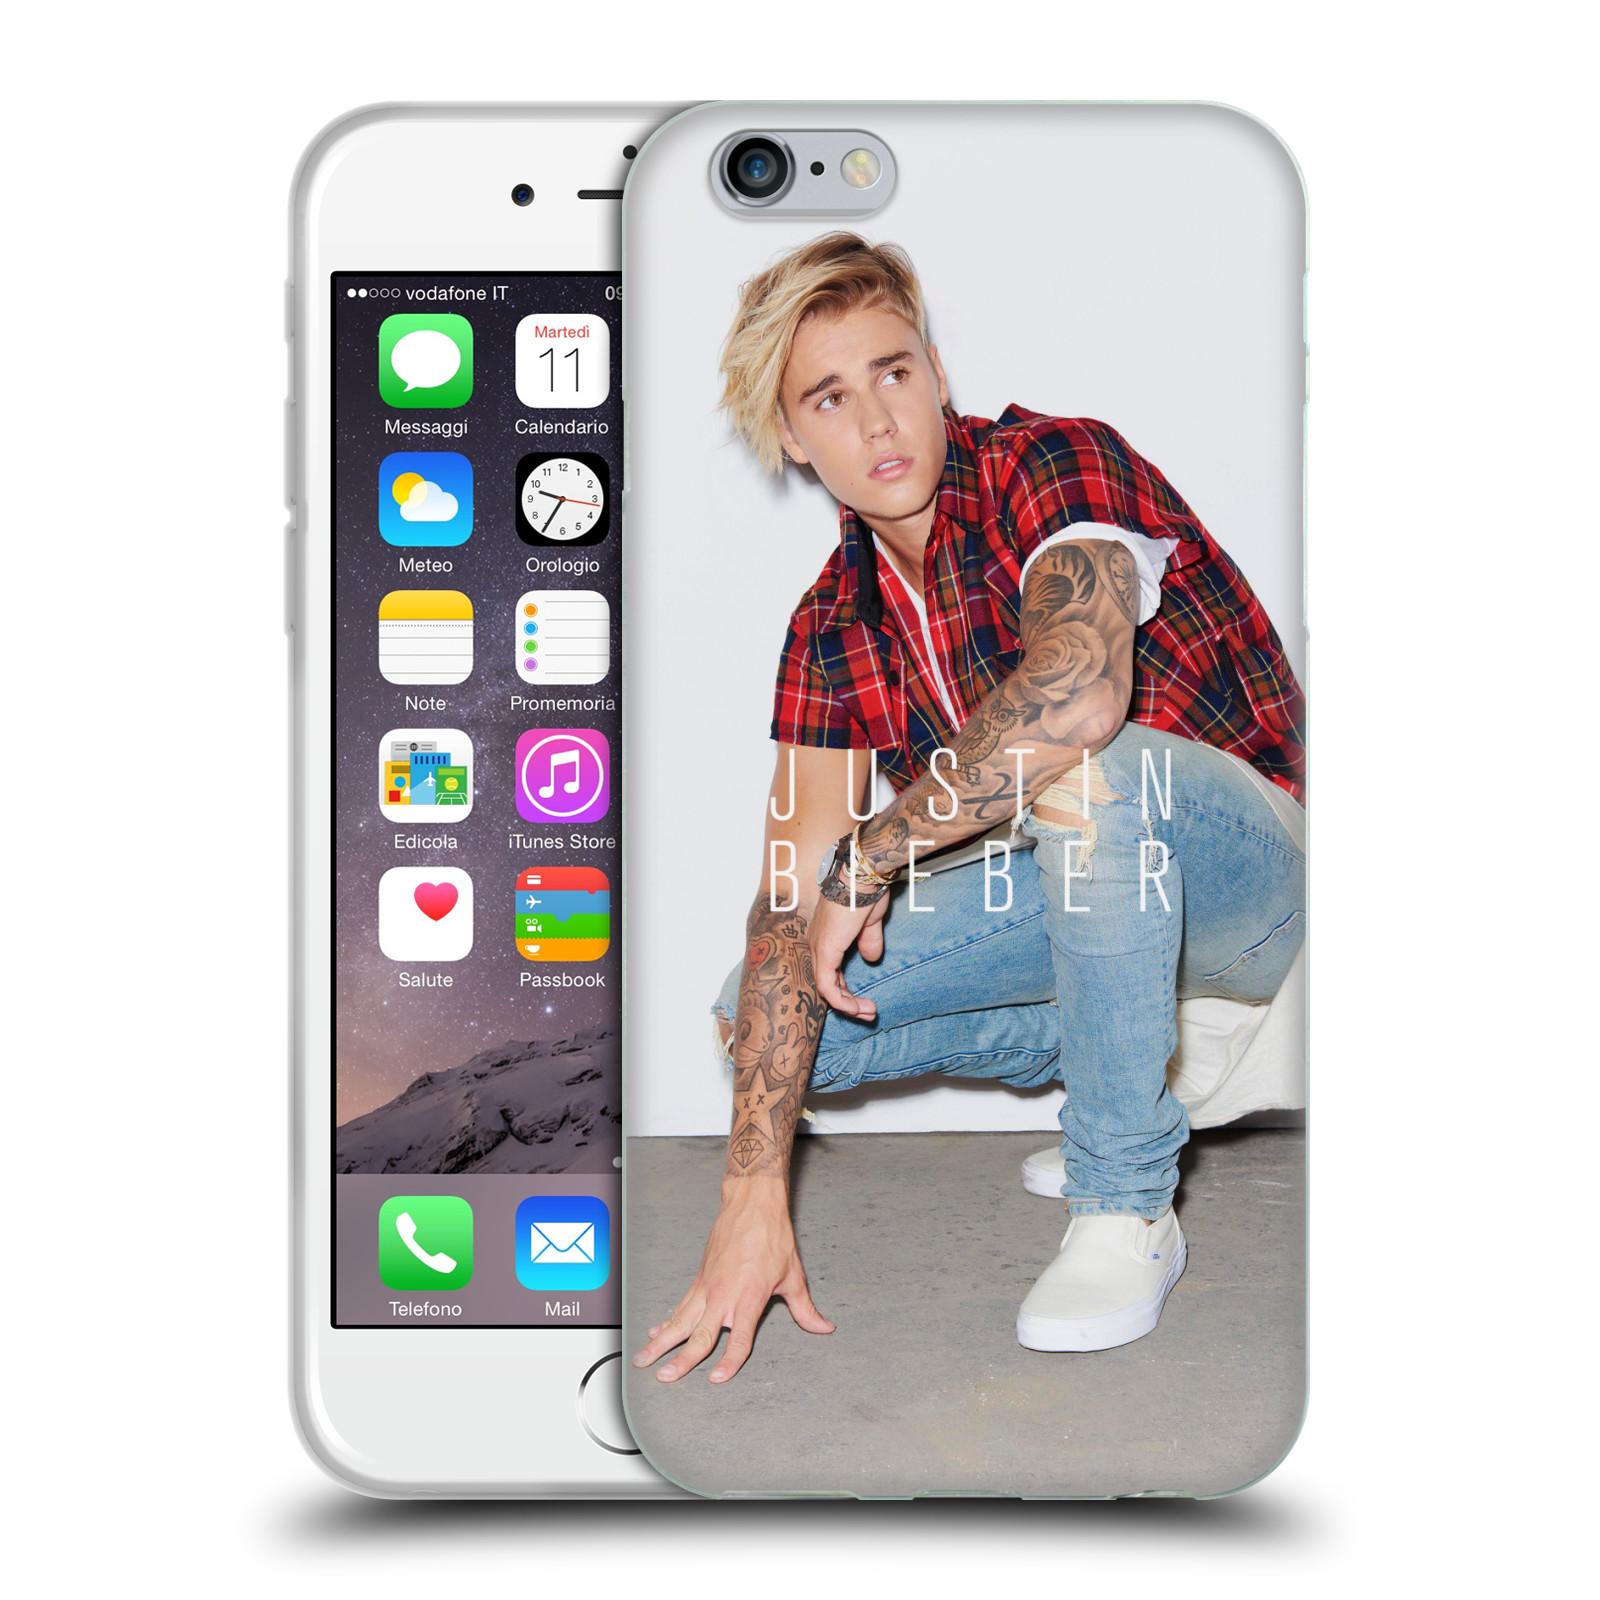 HEAD CASE silikonový obal na mobil Apple Iphone 6 / 6S originální potisk Justin Bieber Uncropped